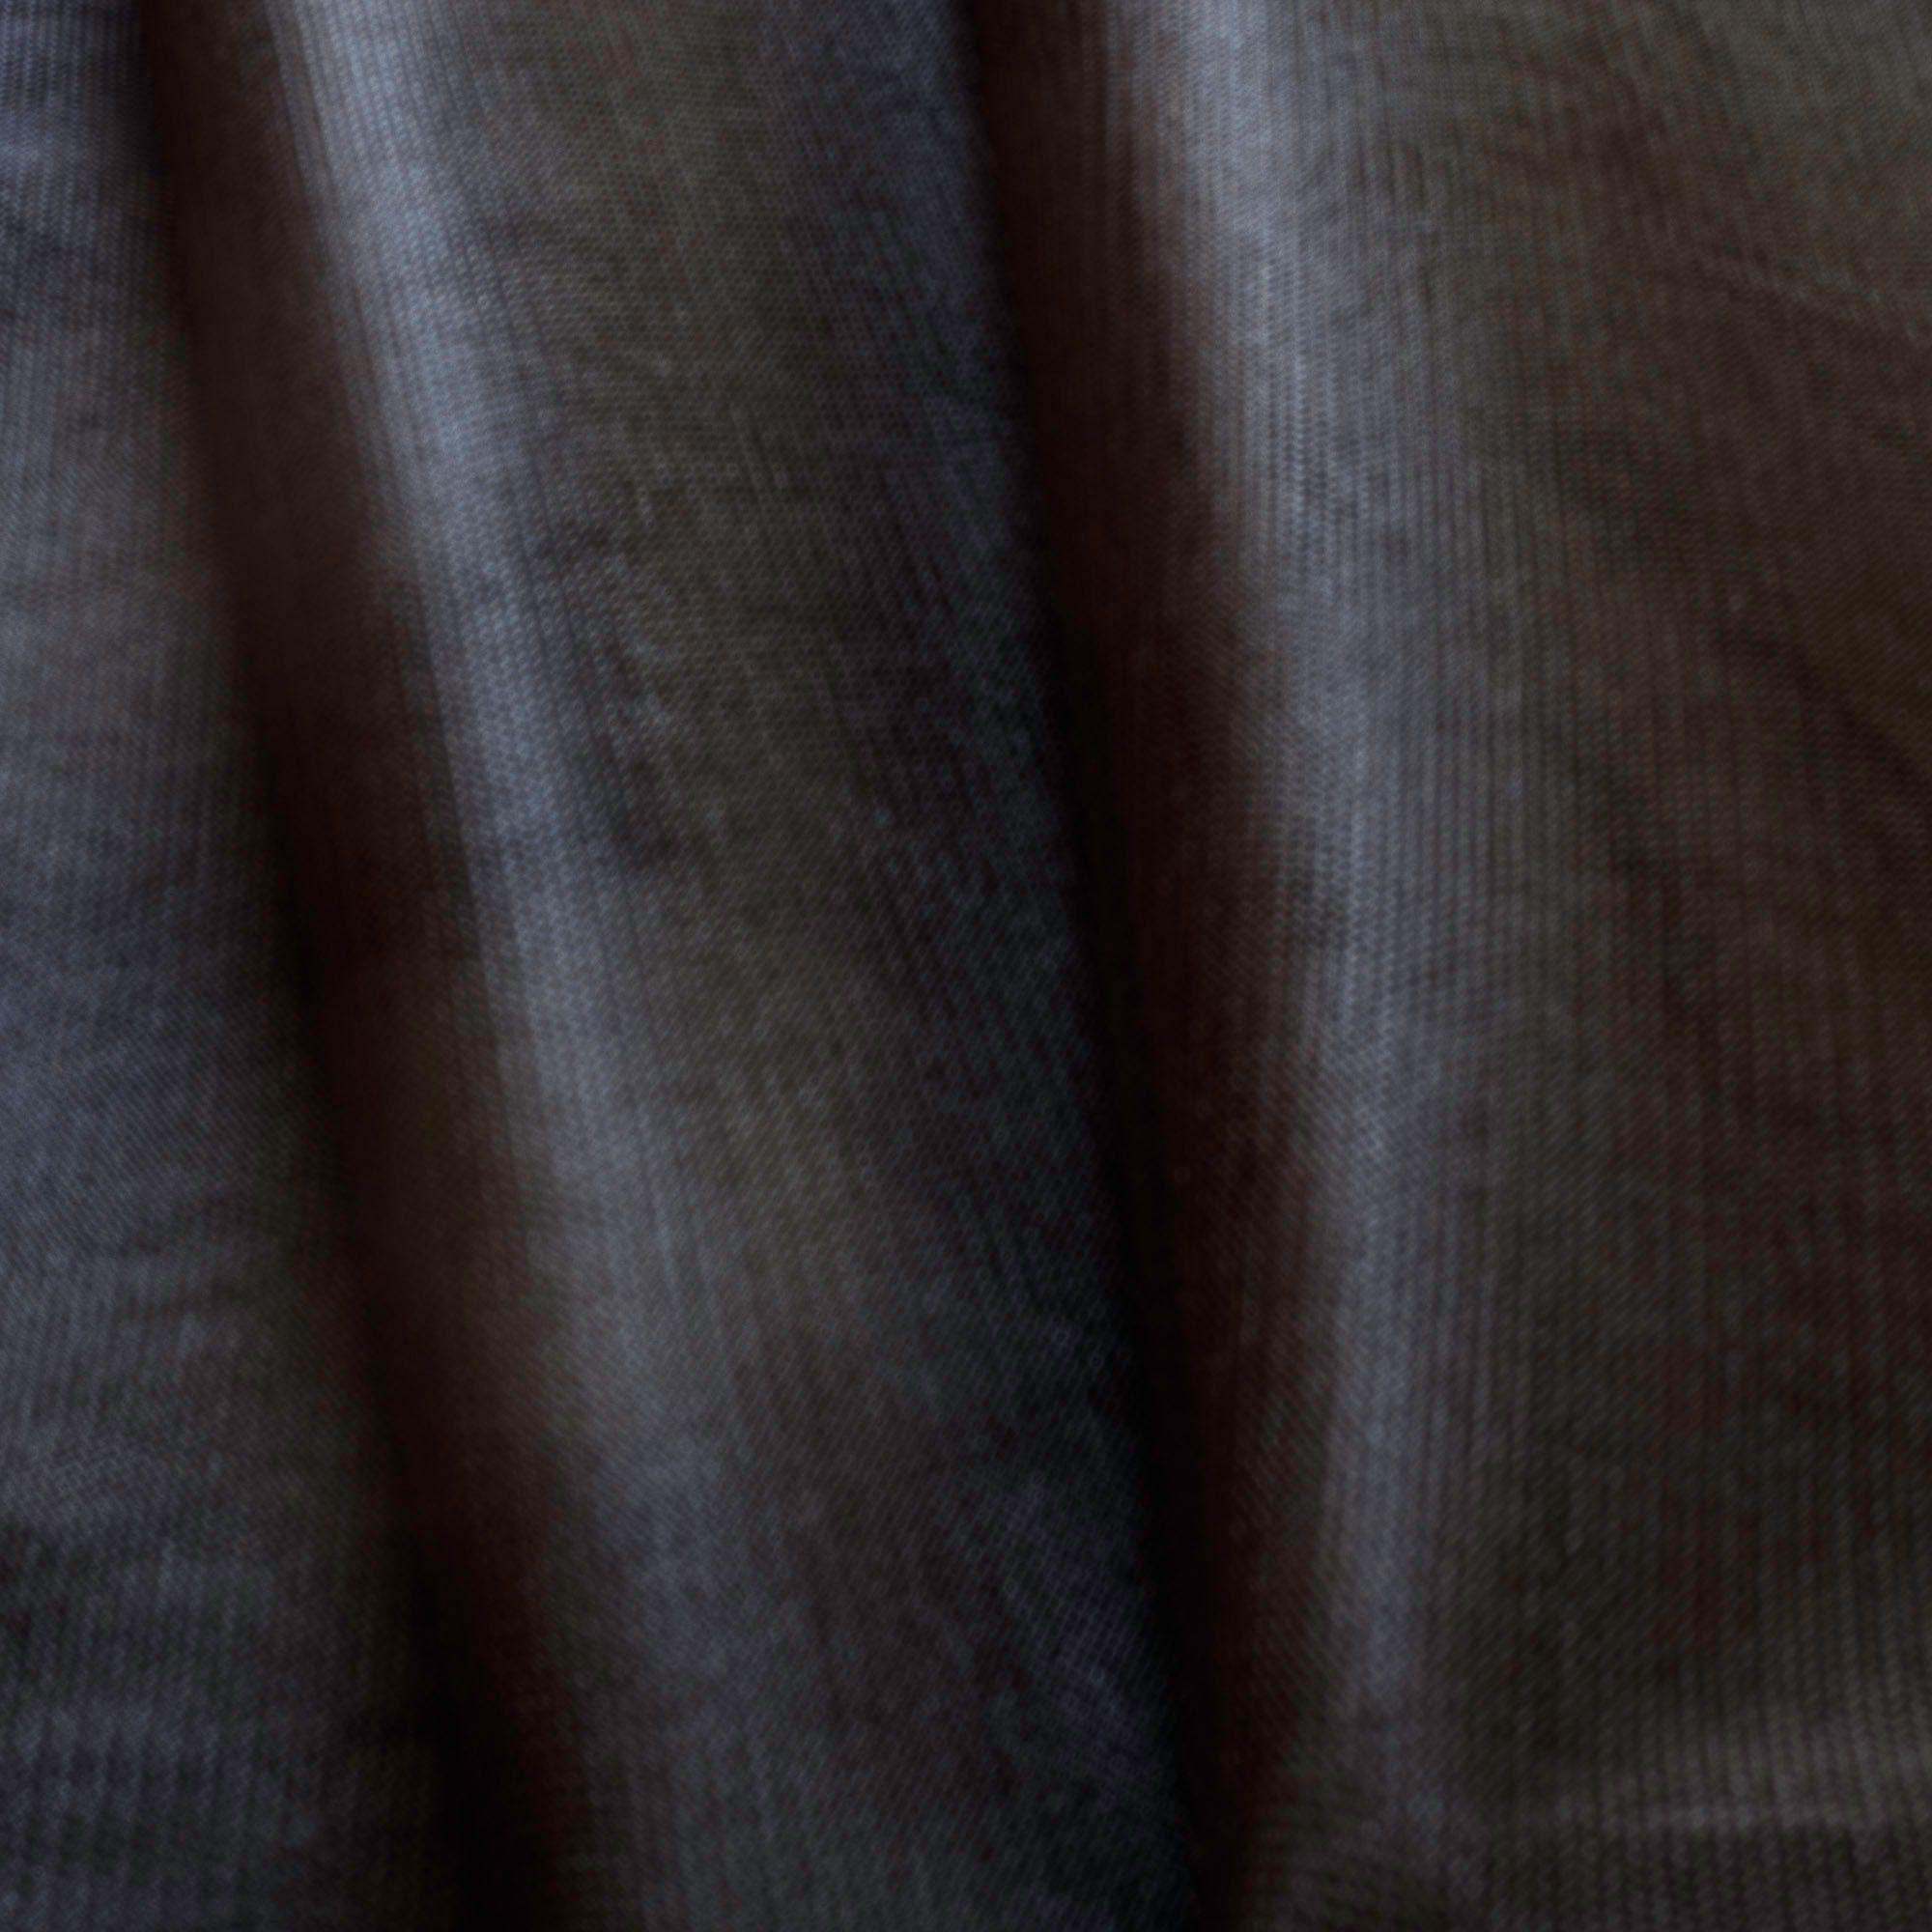 Tecido Filó Preto 100% Poliamida 3 m Largura